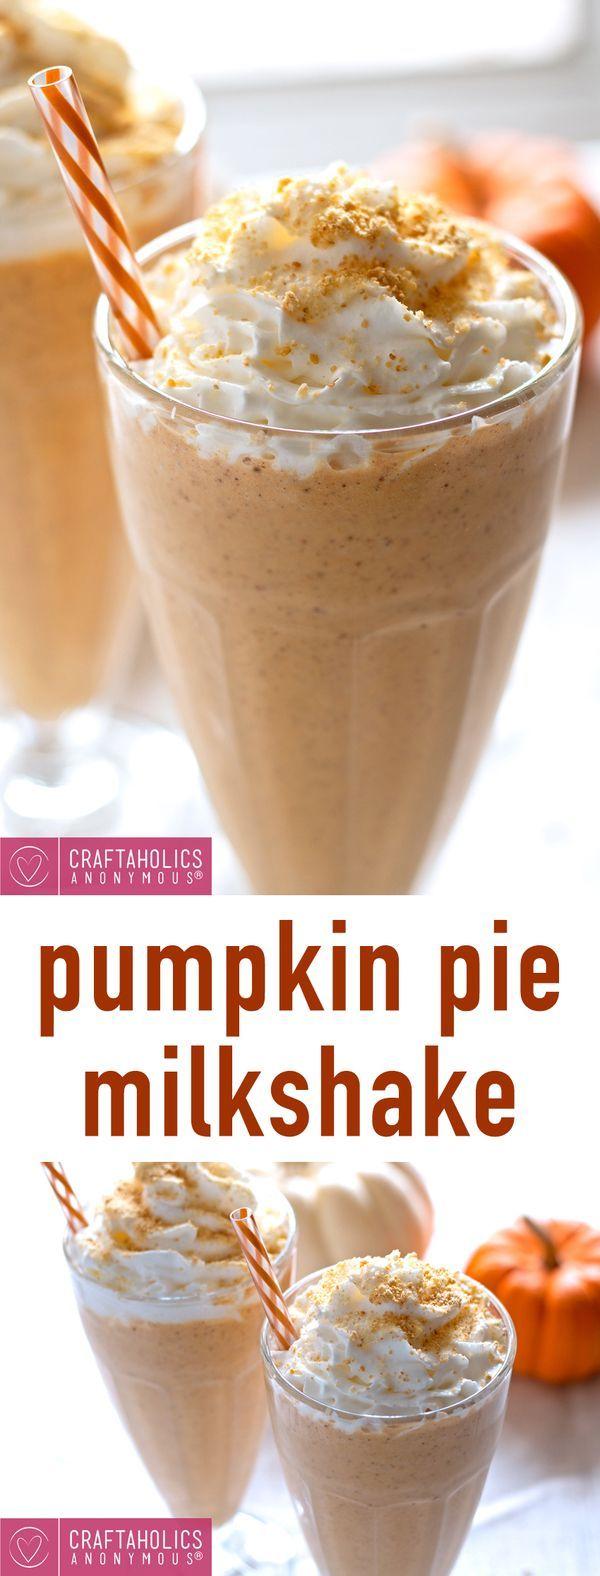 Amazing Pumpkin Pie Milkshake recipe || Yummy fall treat full of flavor and deliciousness!